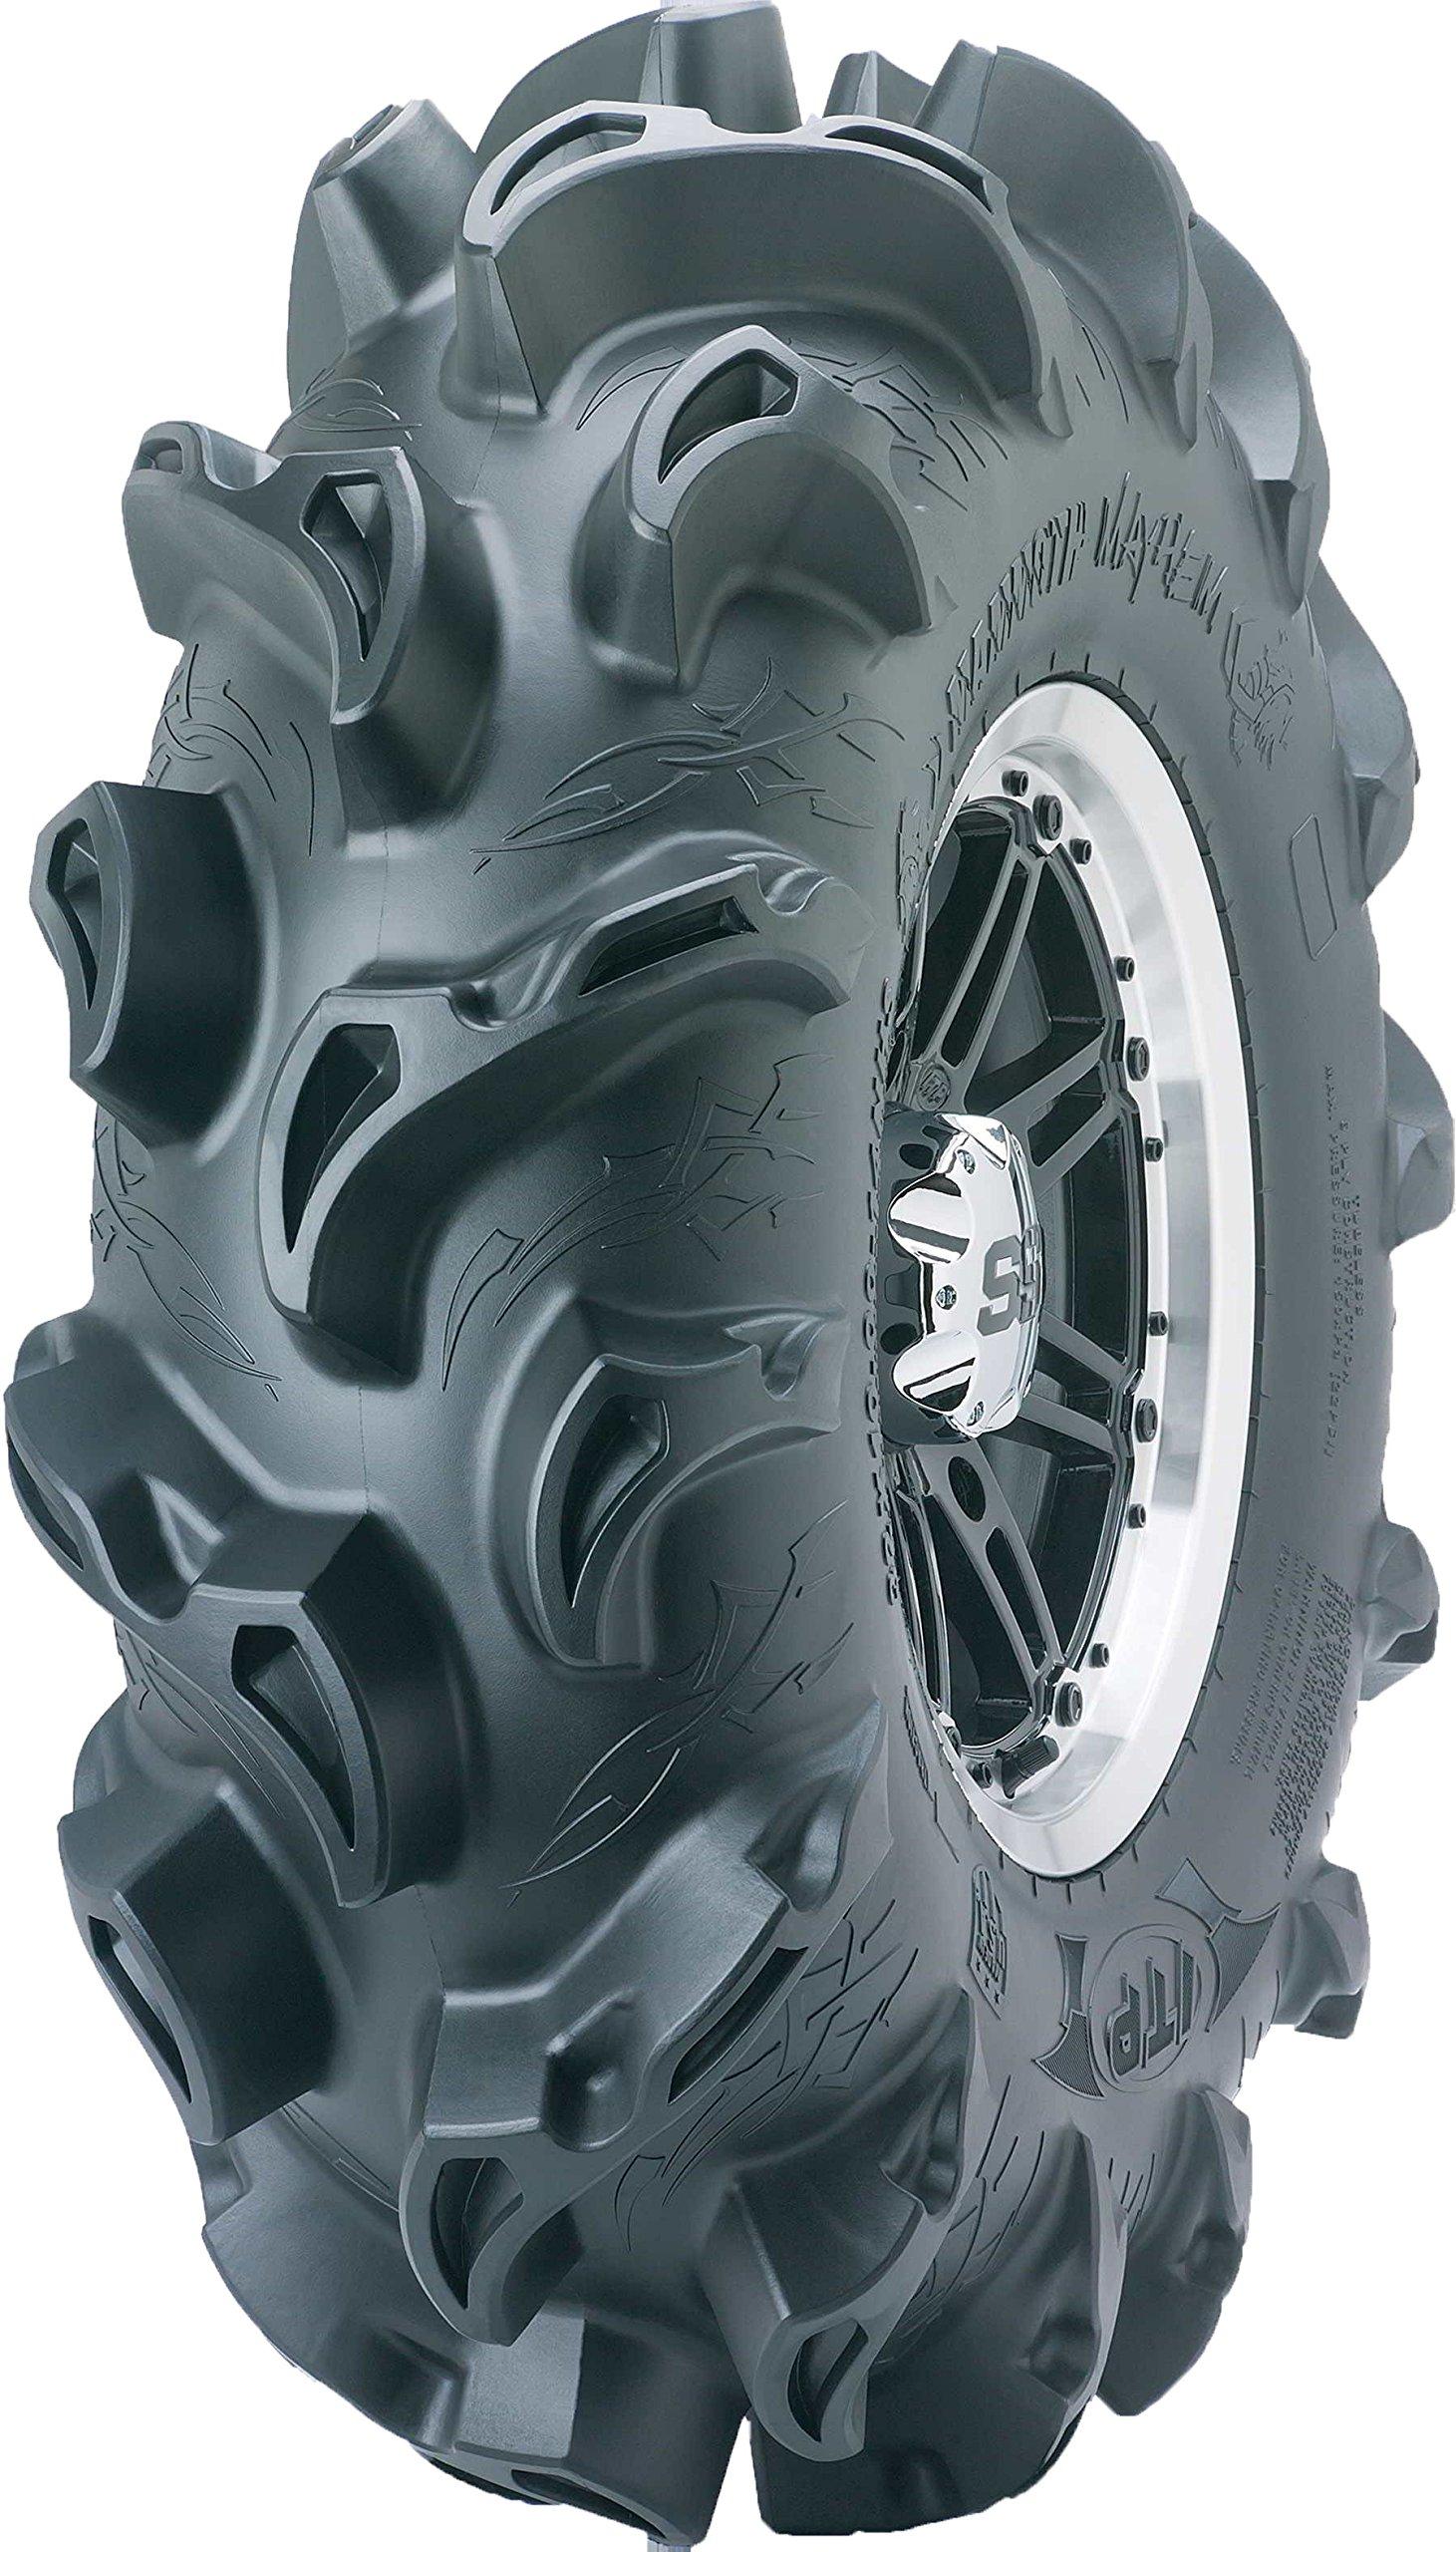 ITP Mammoth Mayhem Mud Terrain ATV Tire 32x10-14